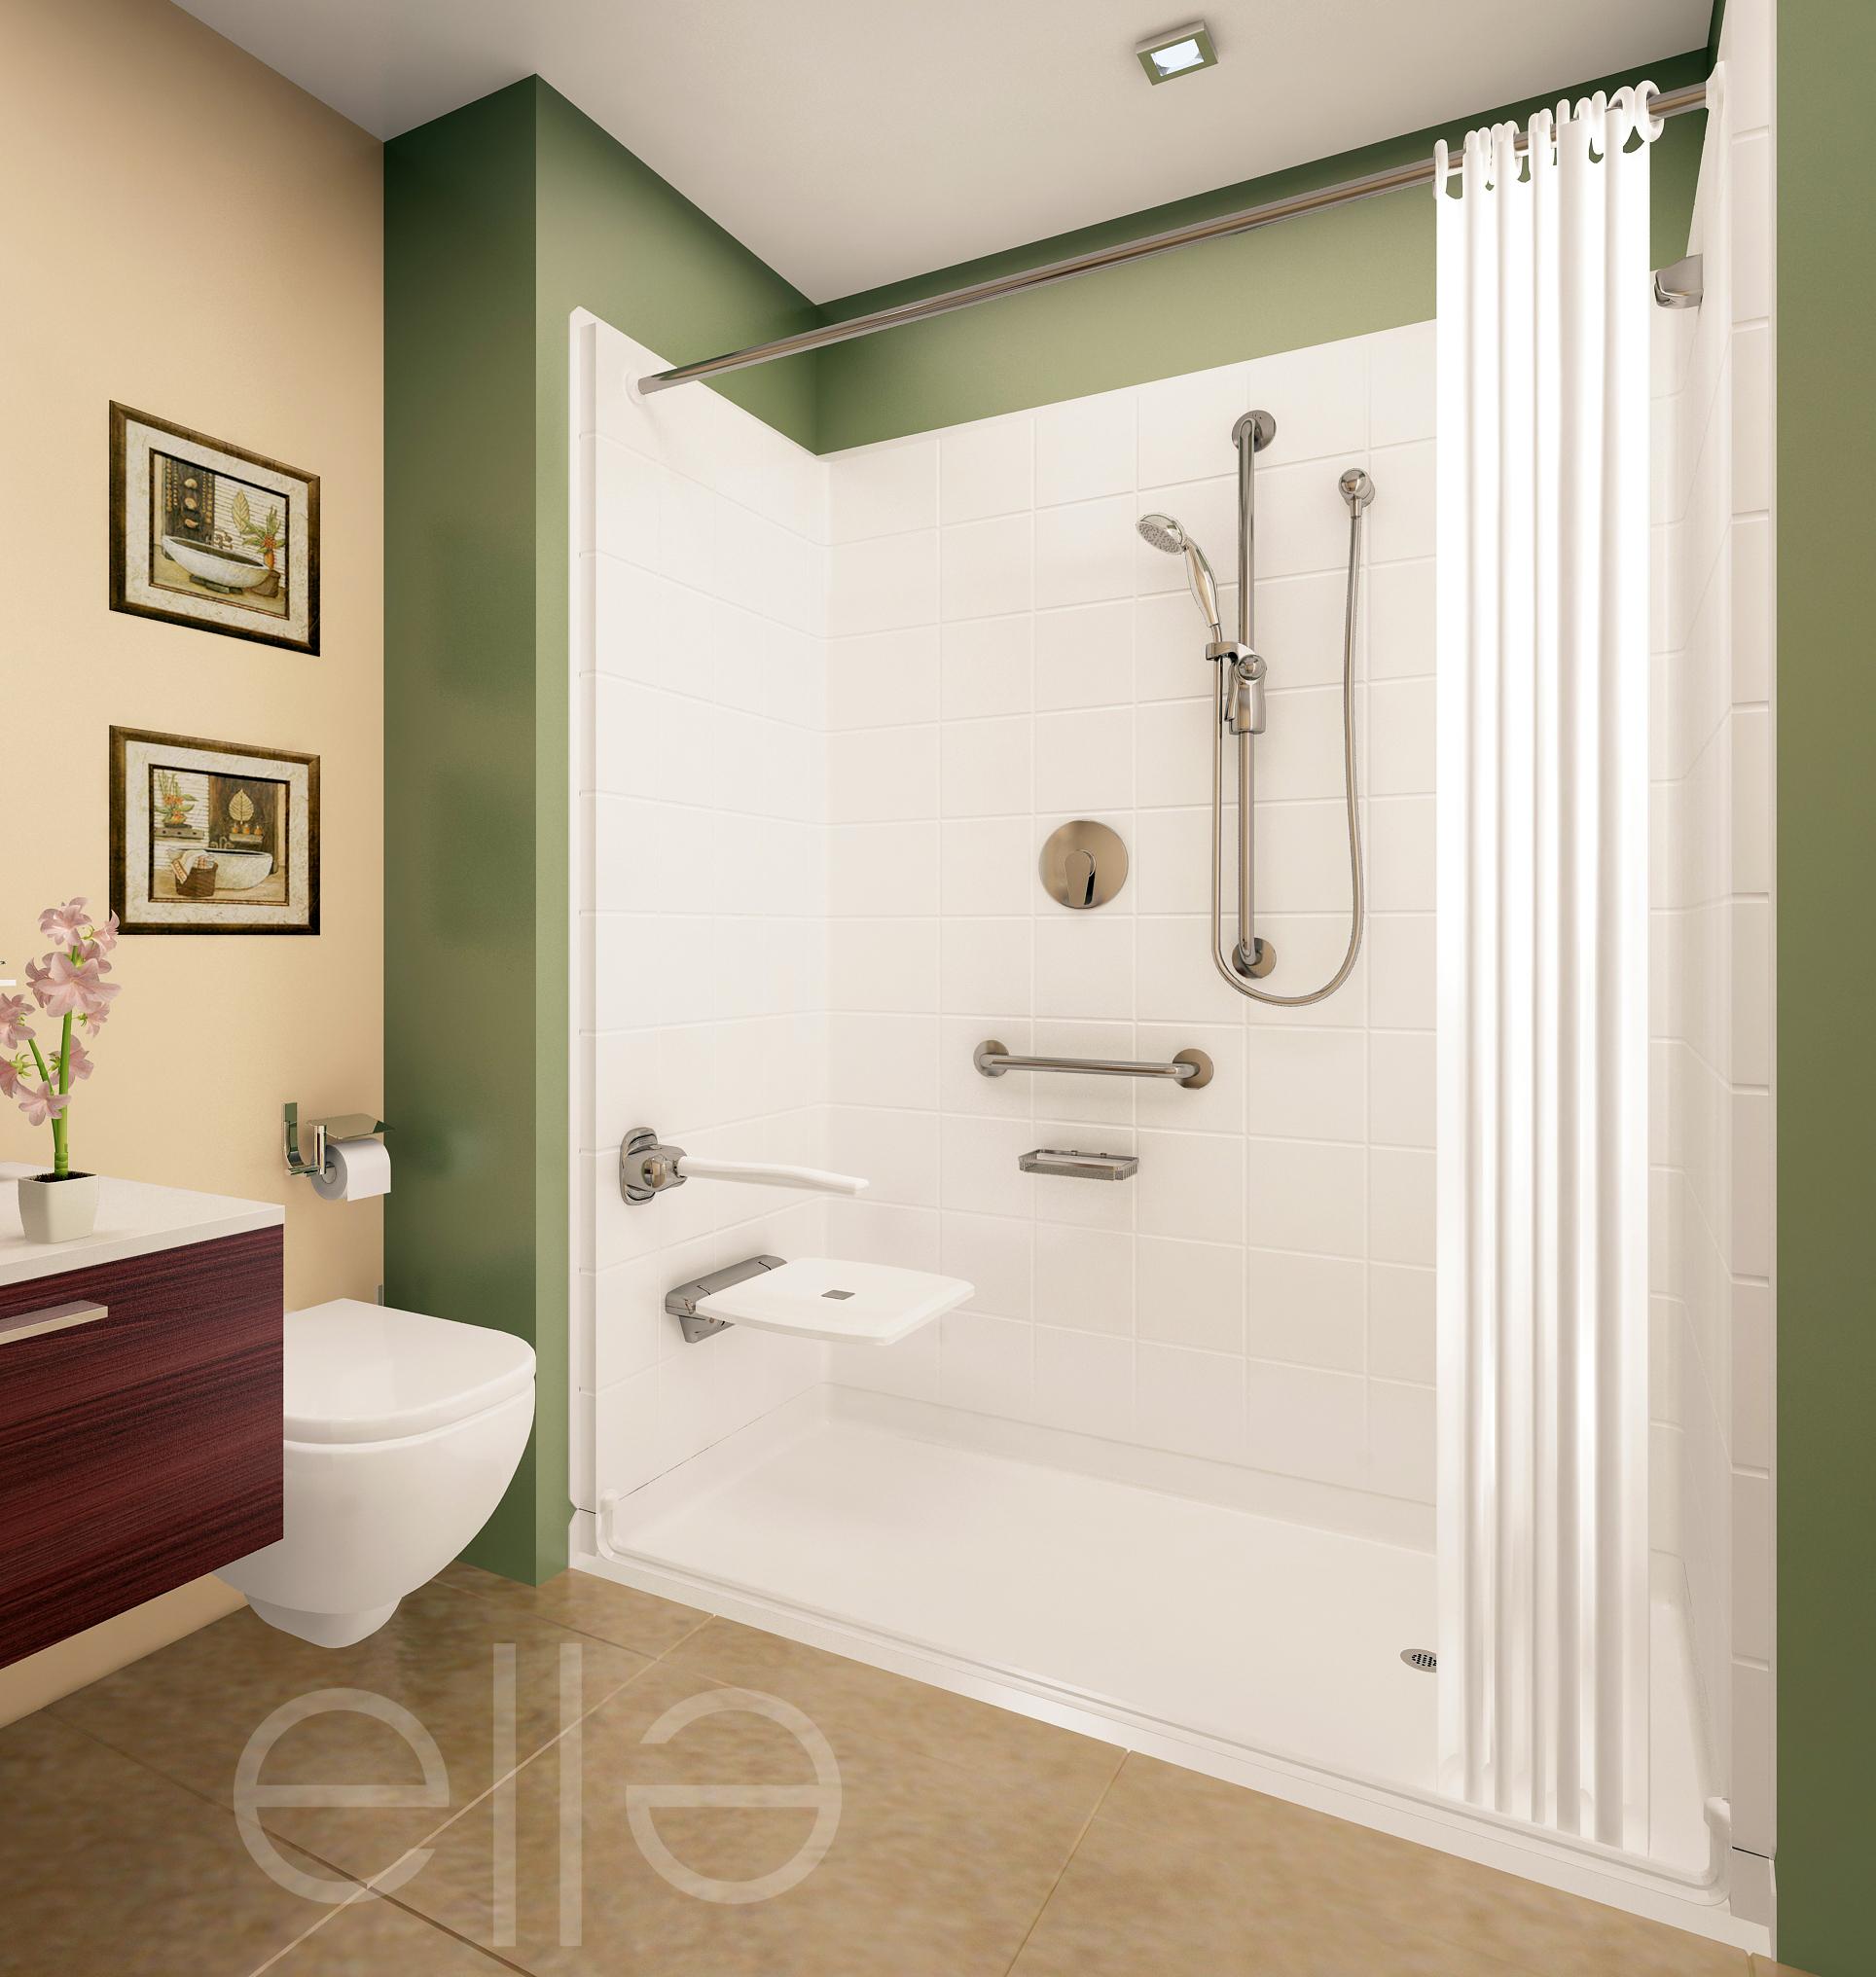 New Shower In A Box Kit From Ella Walk In Baths Brings Spa